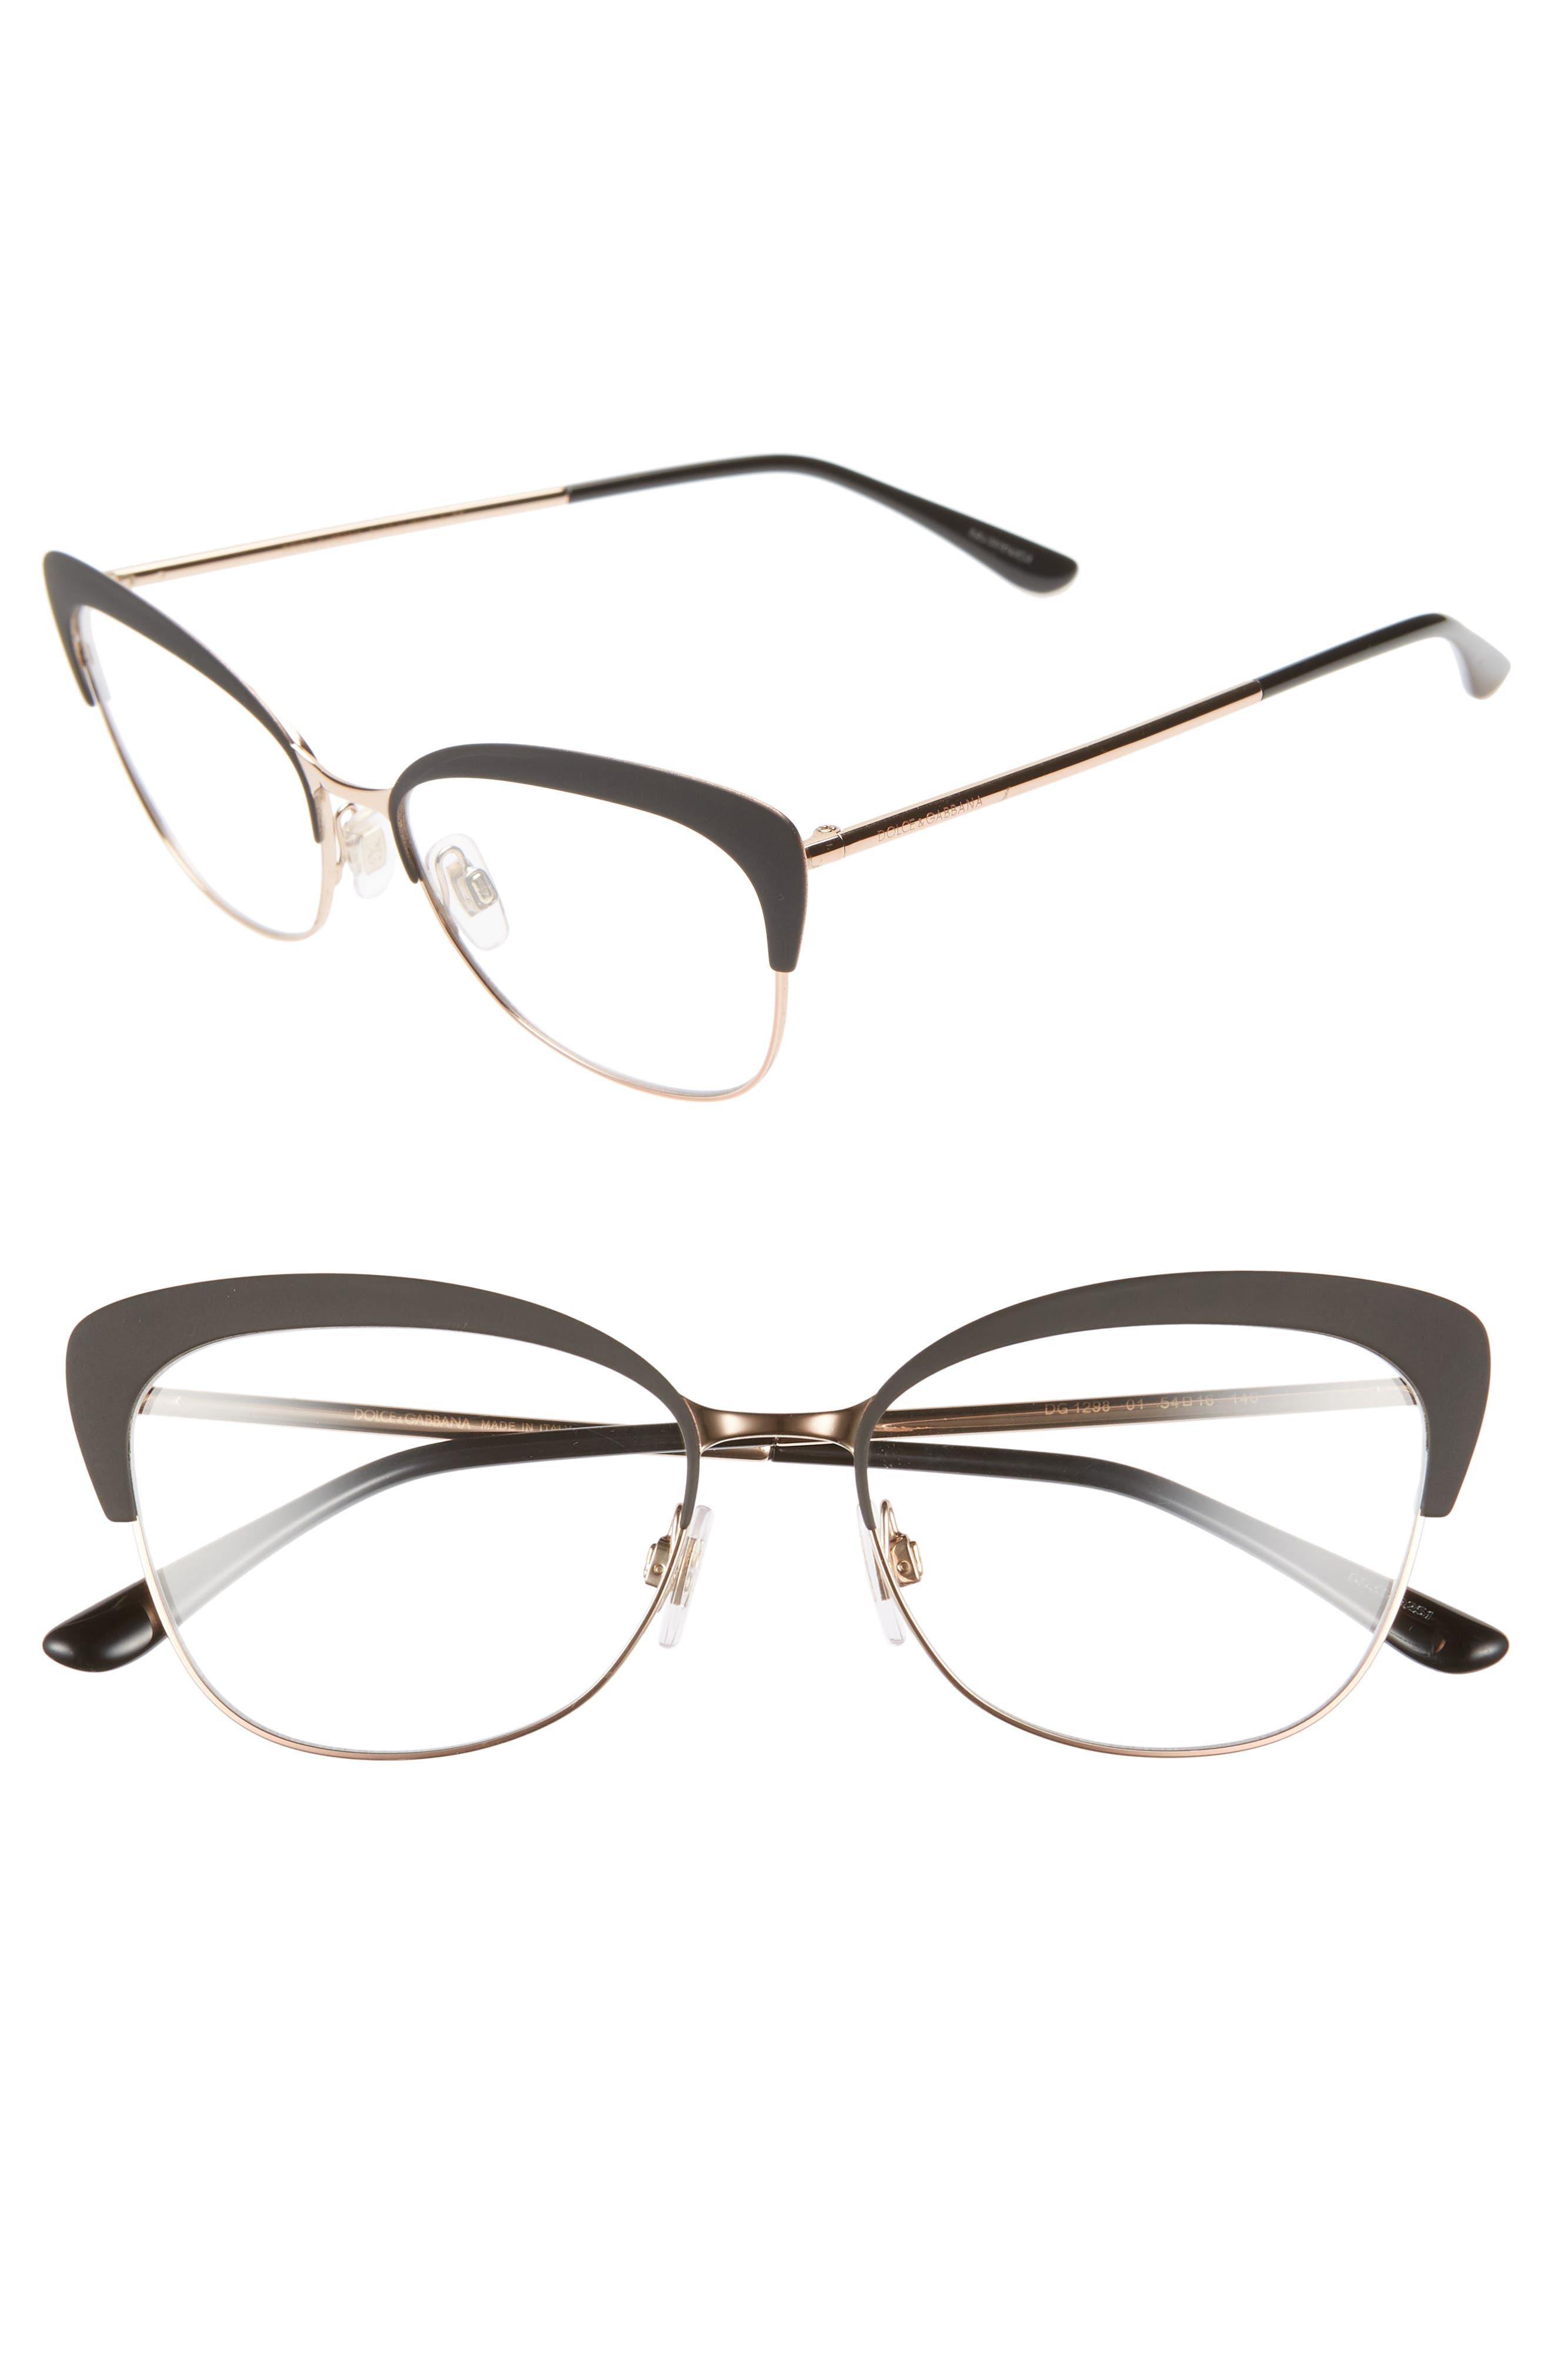 54mm Optical Glasses,                             Main thumbnail 1, color,                             BLACK/ PINK